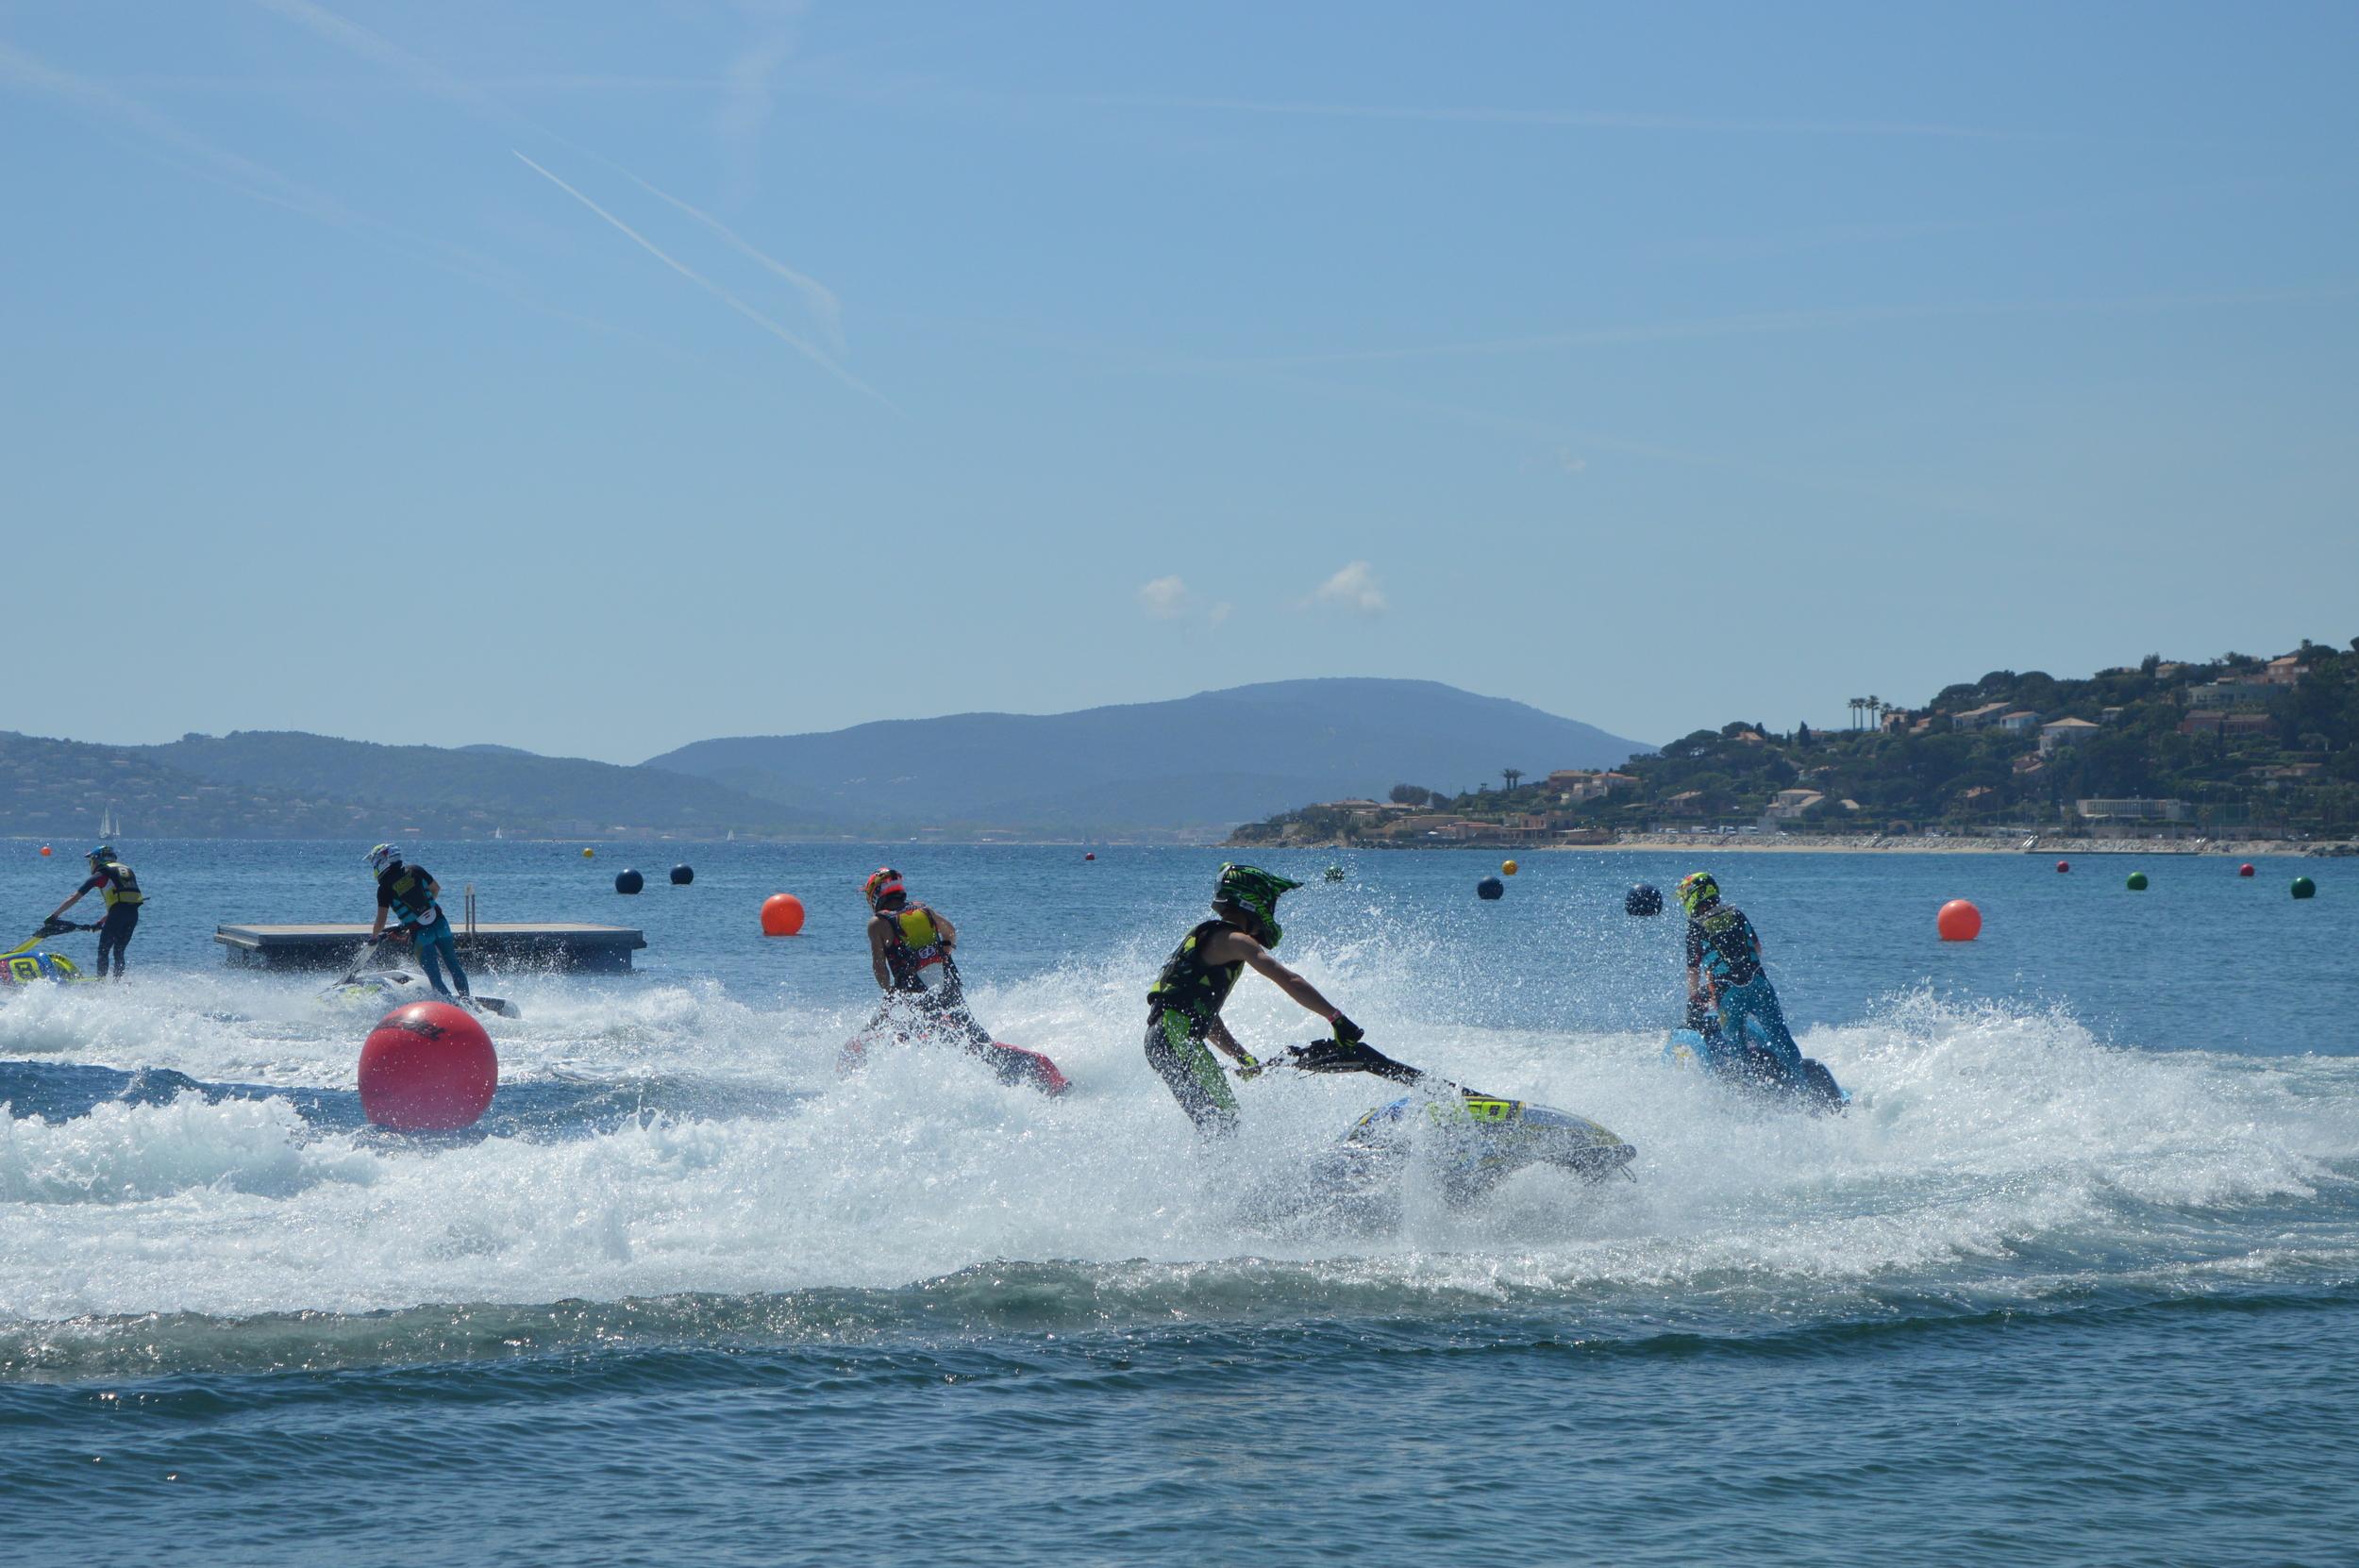 Ski's at Ste Maxime April 16